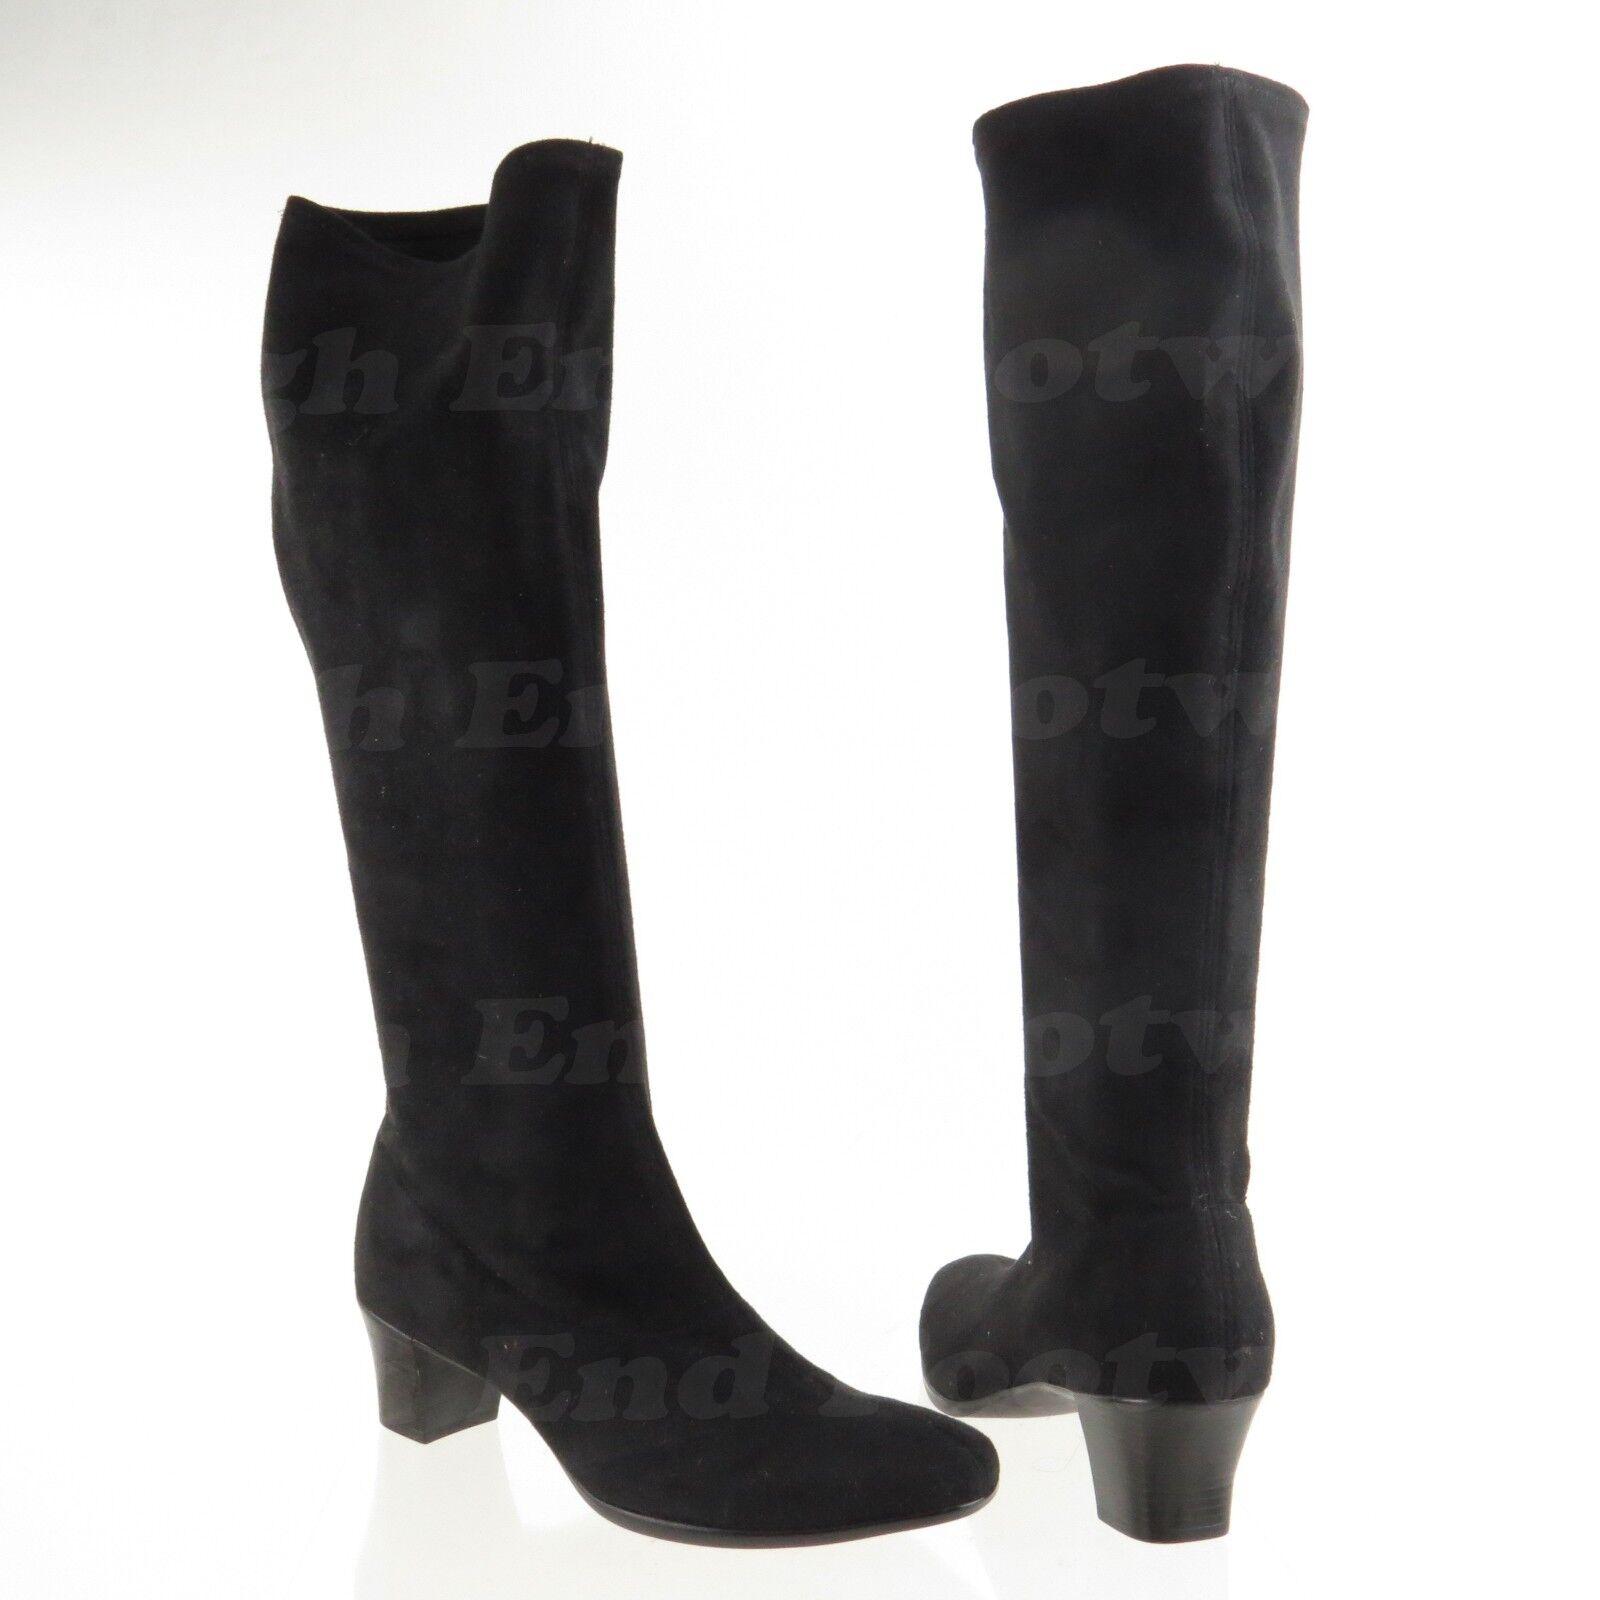 Munro Ann Gamuza Negra Elástico Eje de Alto botas M611187 para mujer N